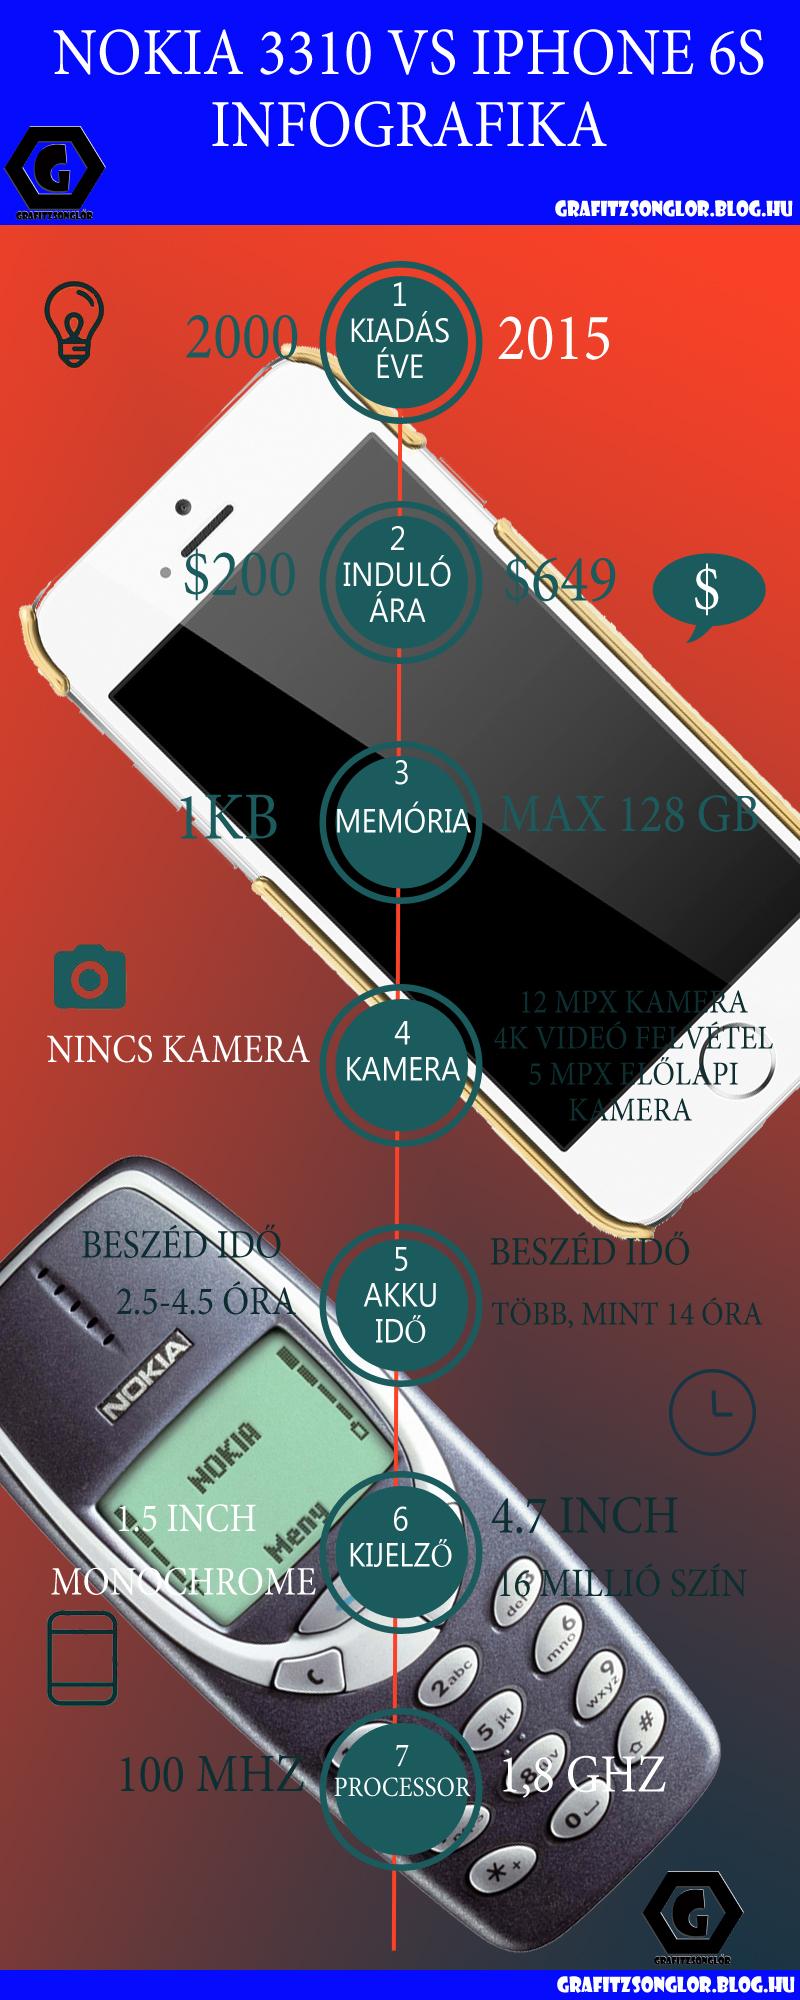 nokia-3310-vs-iphone-6s-infographika.jpg